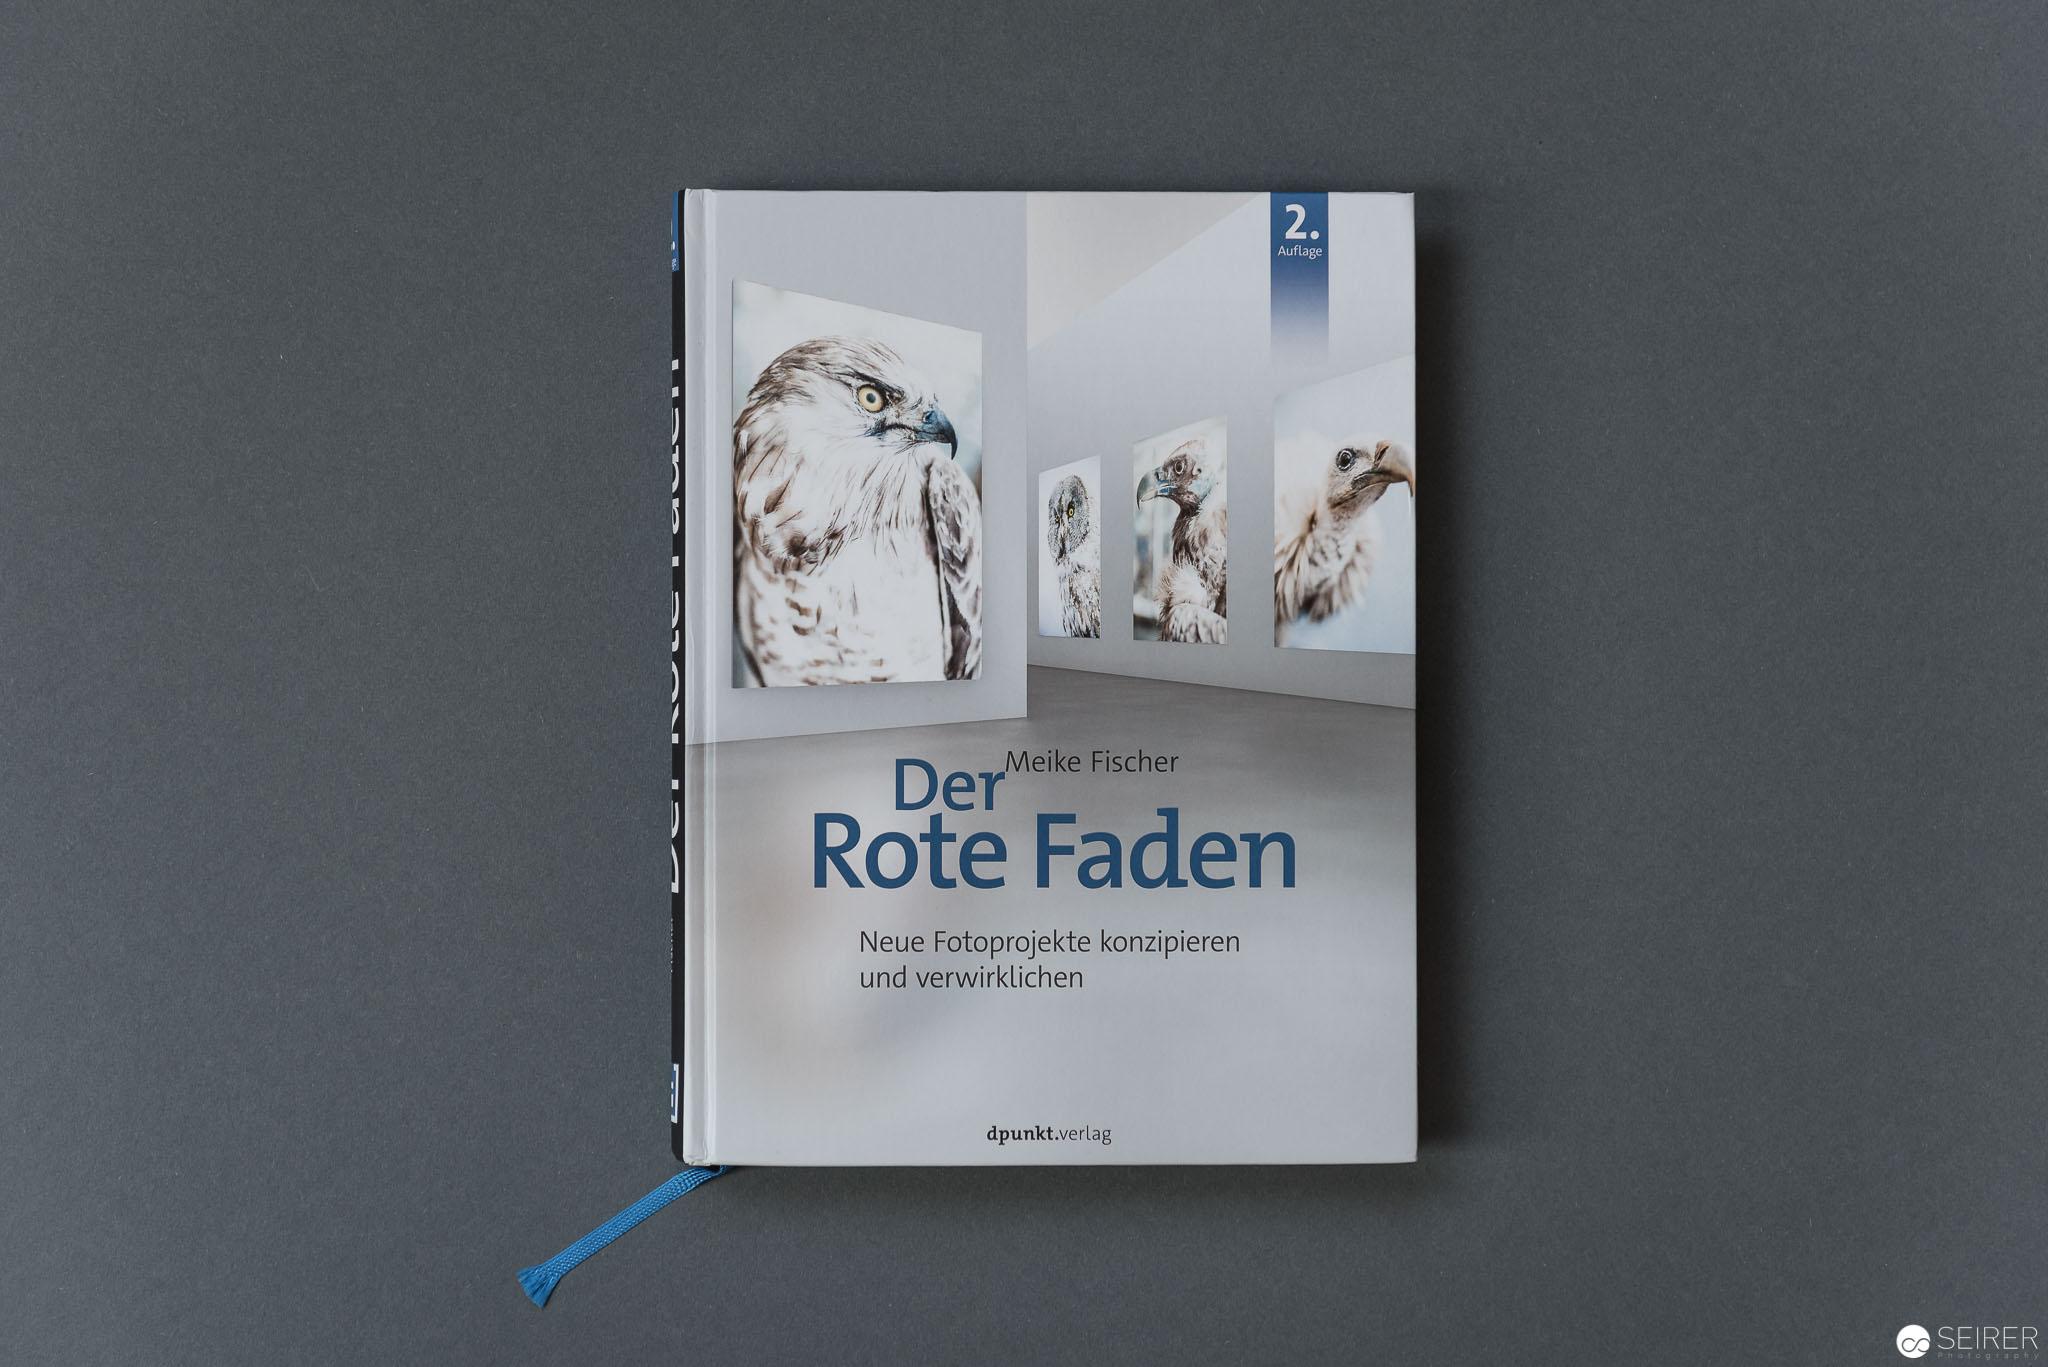 20180325_104016_der_rote_faden_dpunkt_79388.jpg